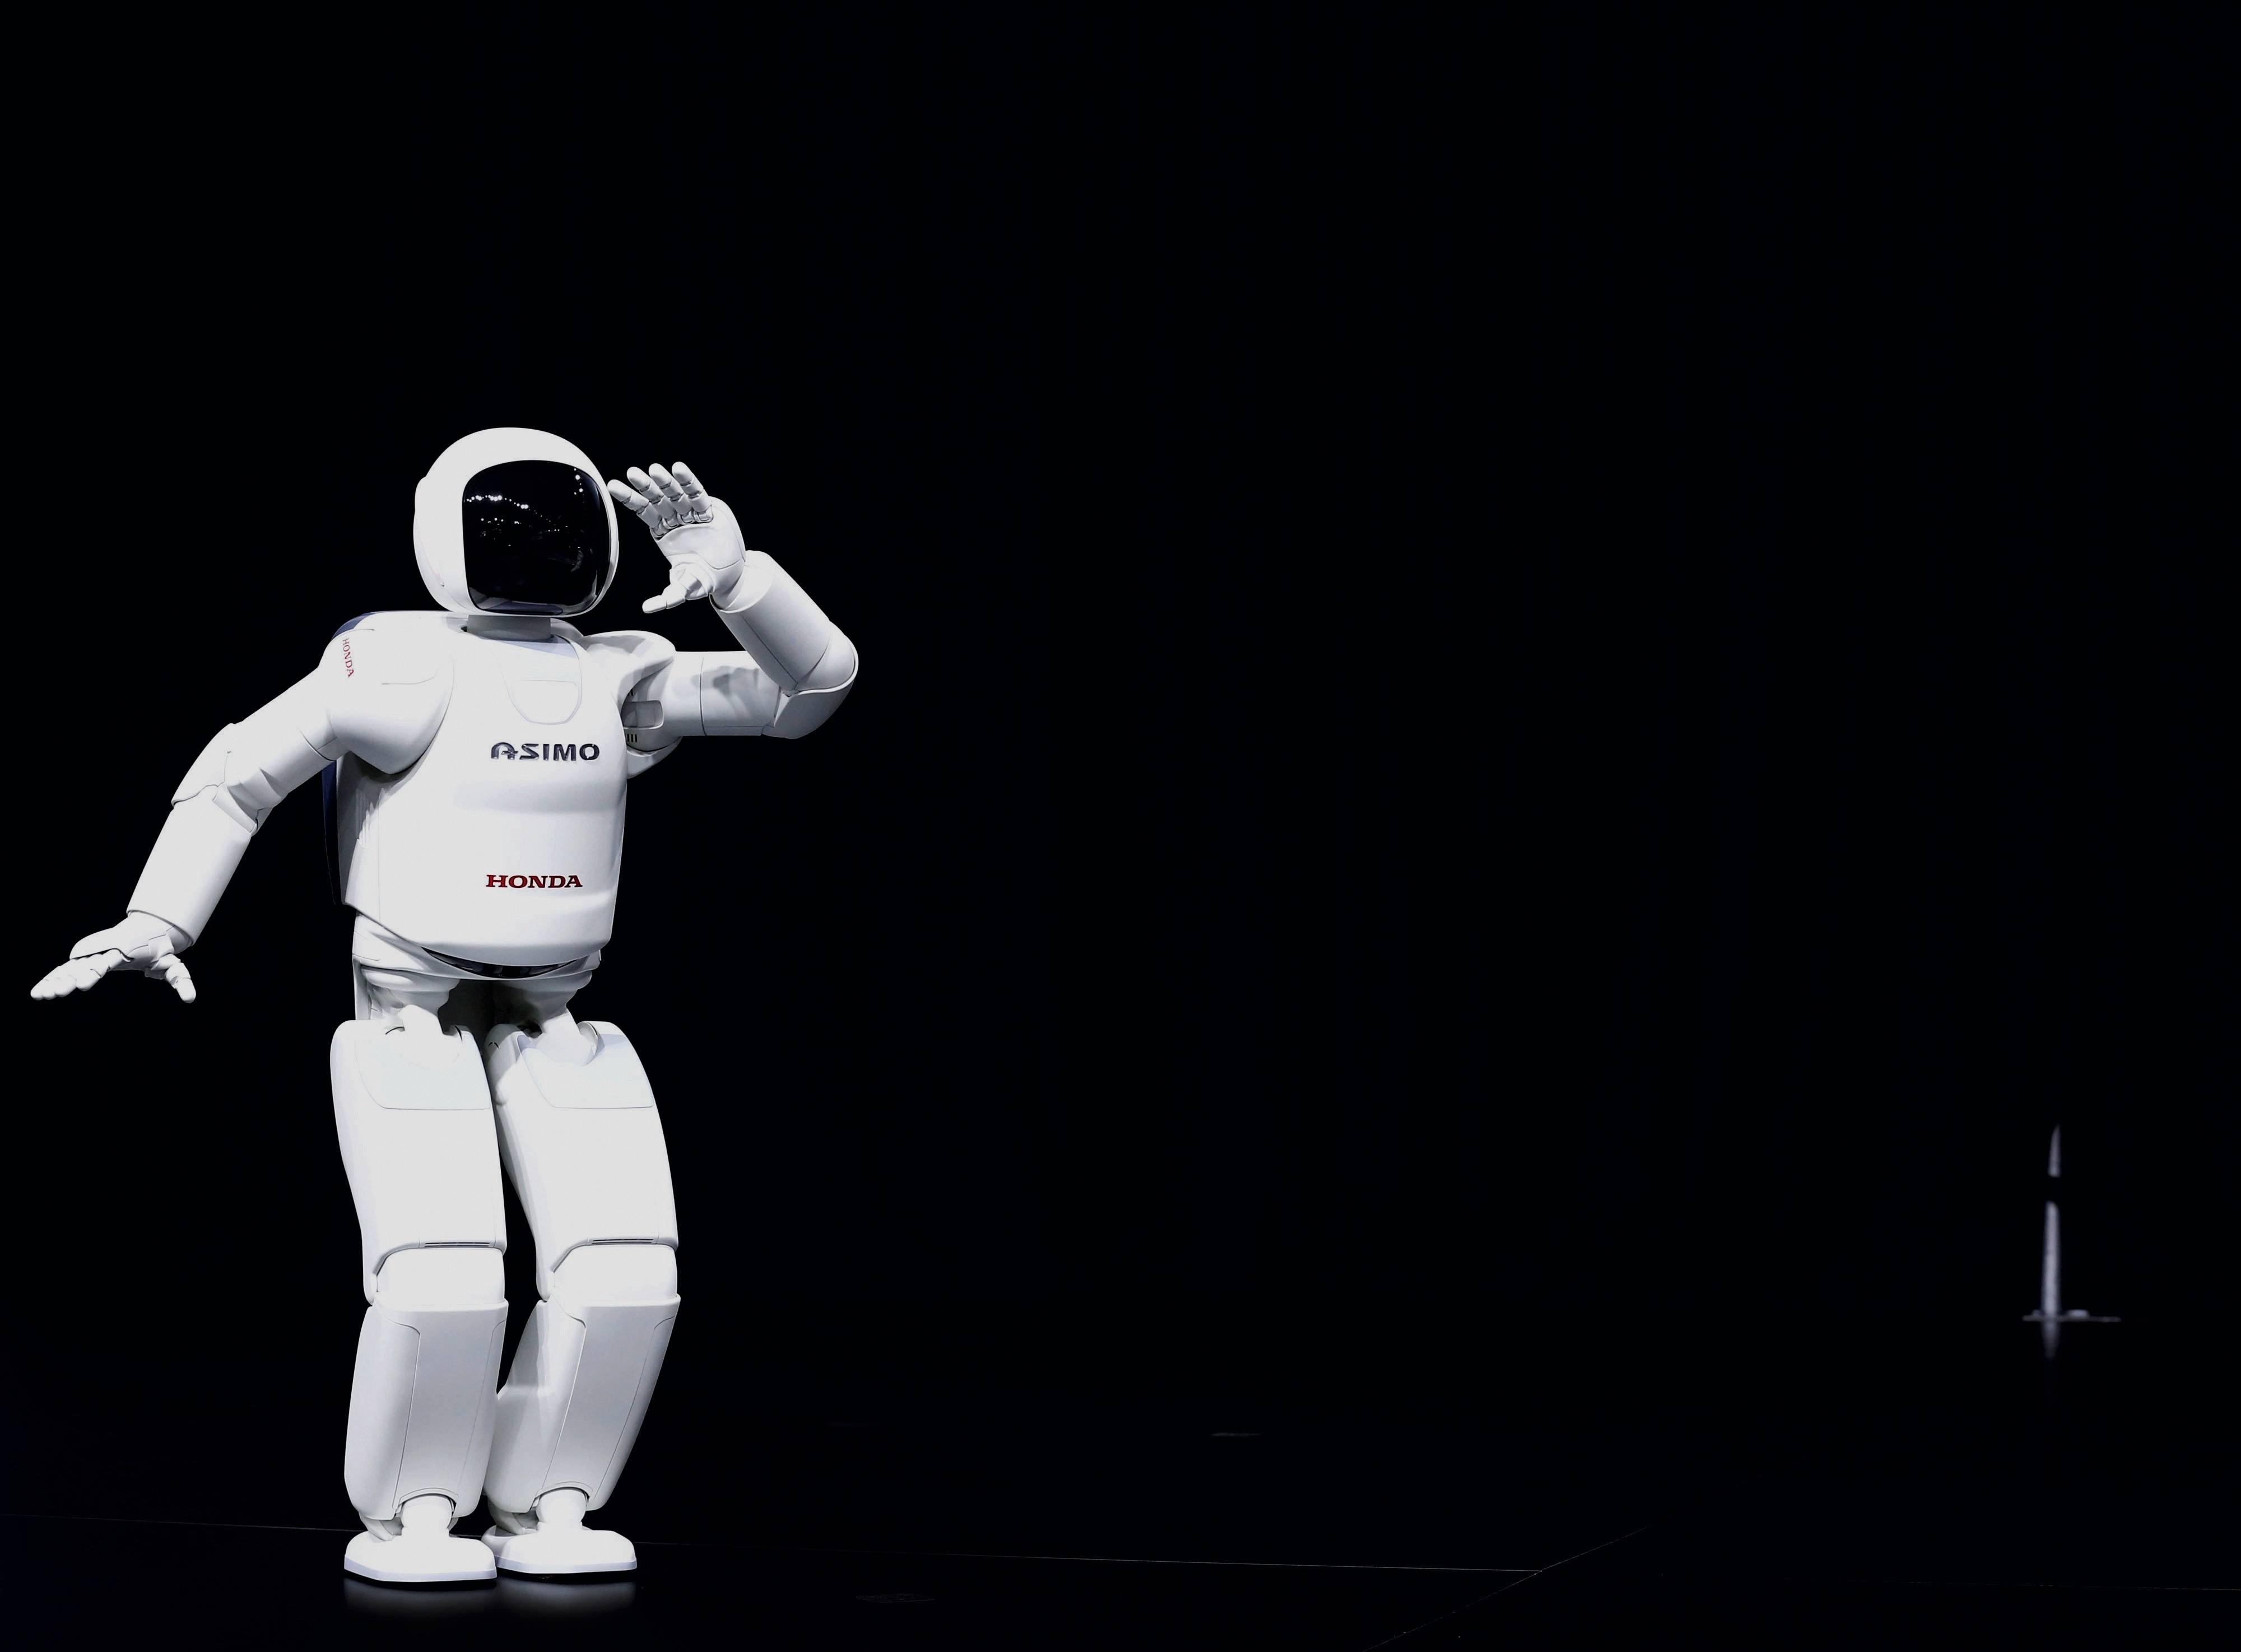 Robo-adviser to reduce 'human error' in investing